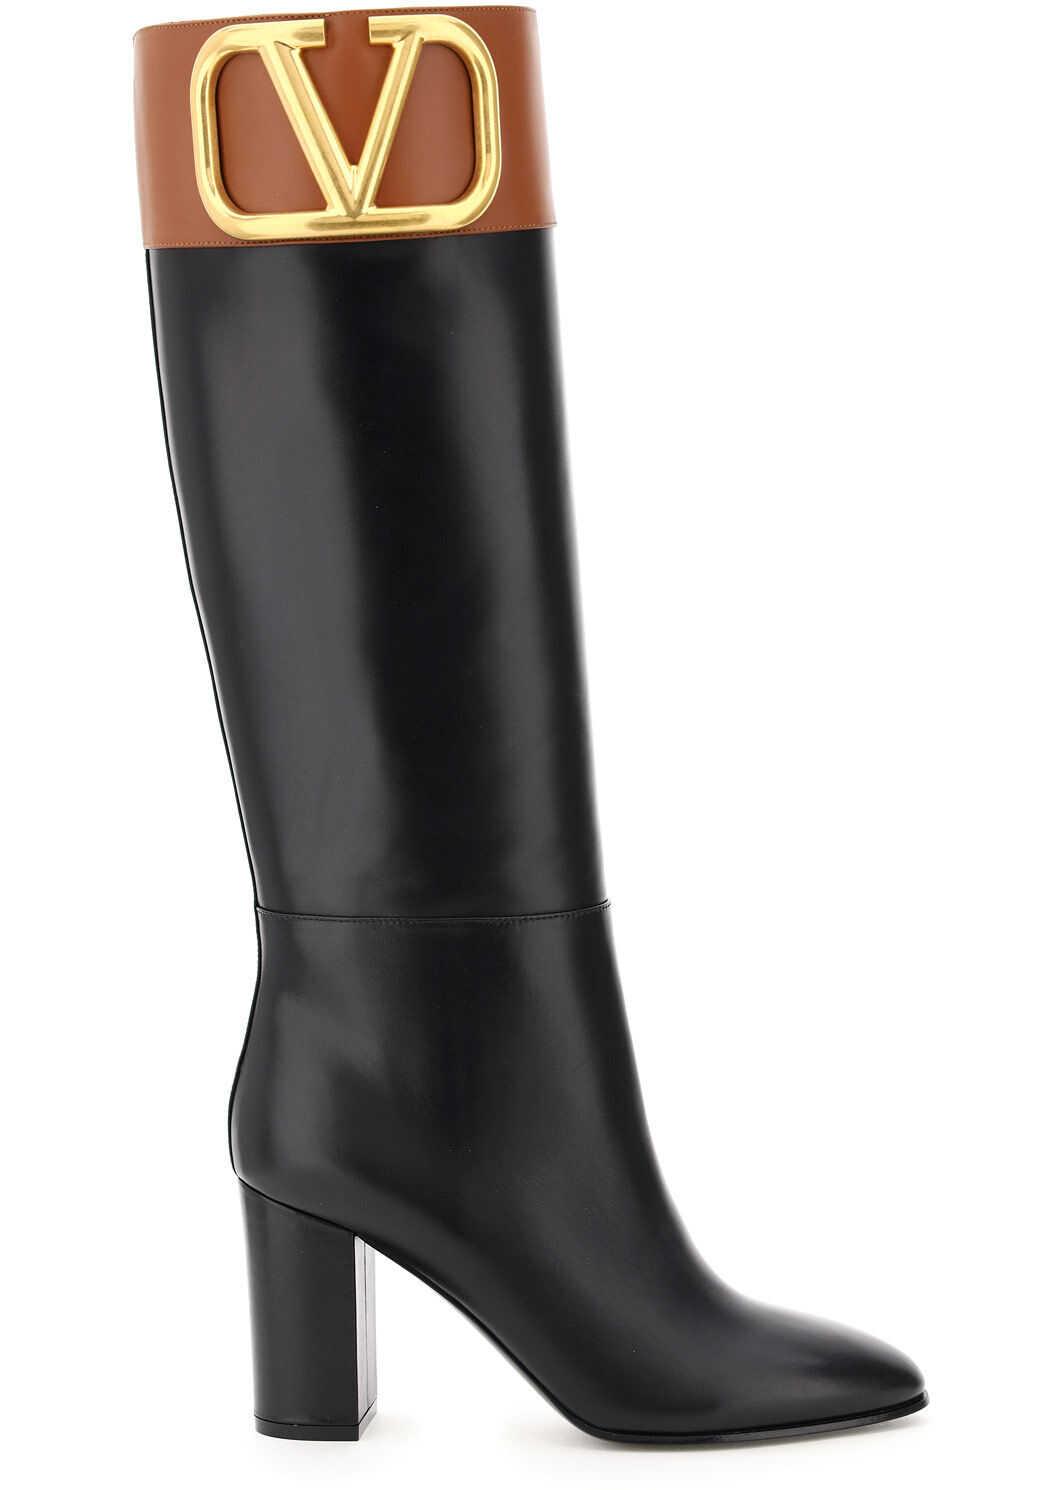 Valentino Garavani Supervee Two-Tone Leather Boots UW2S0Z94AXA NERO SELLERIA imagine b-mall.ro